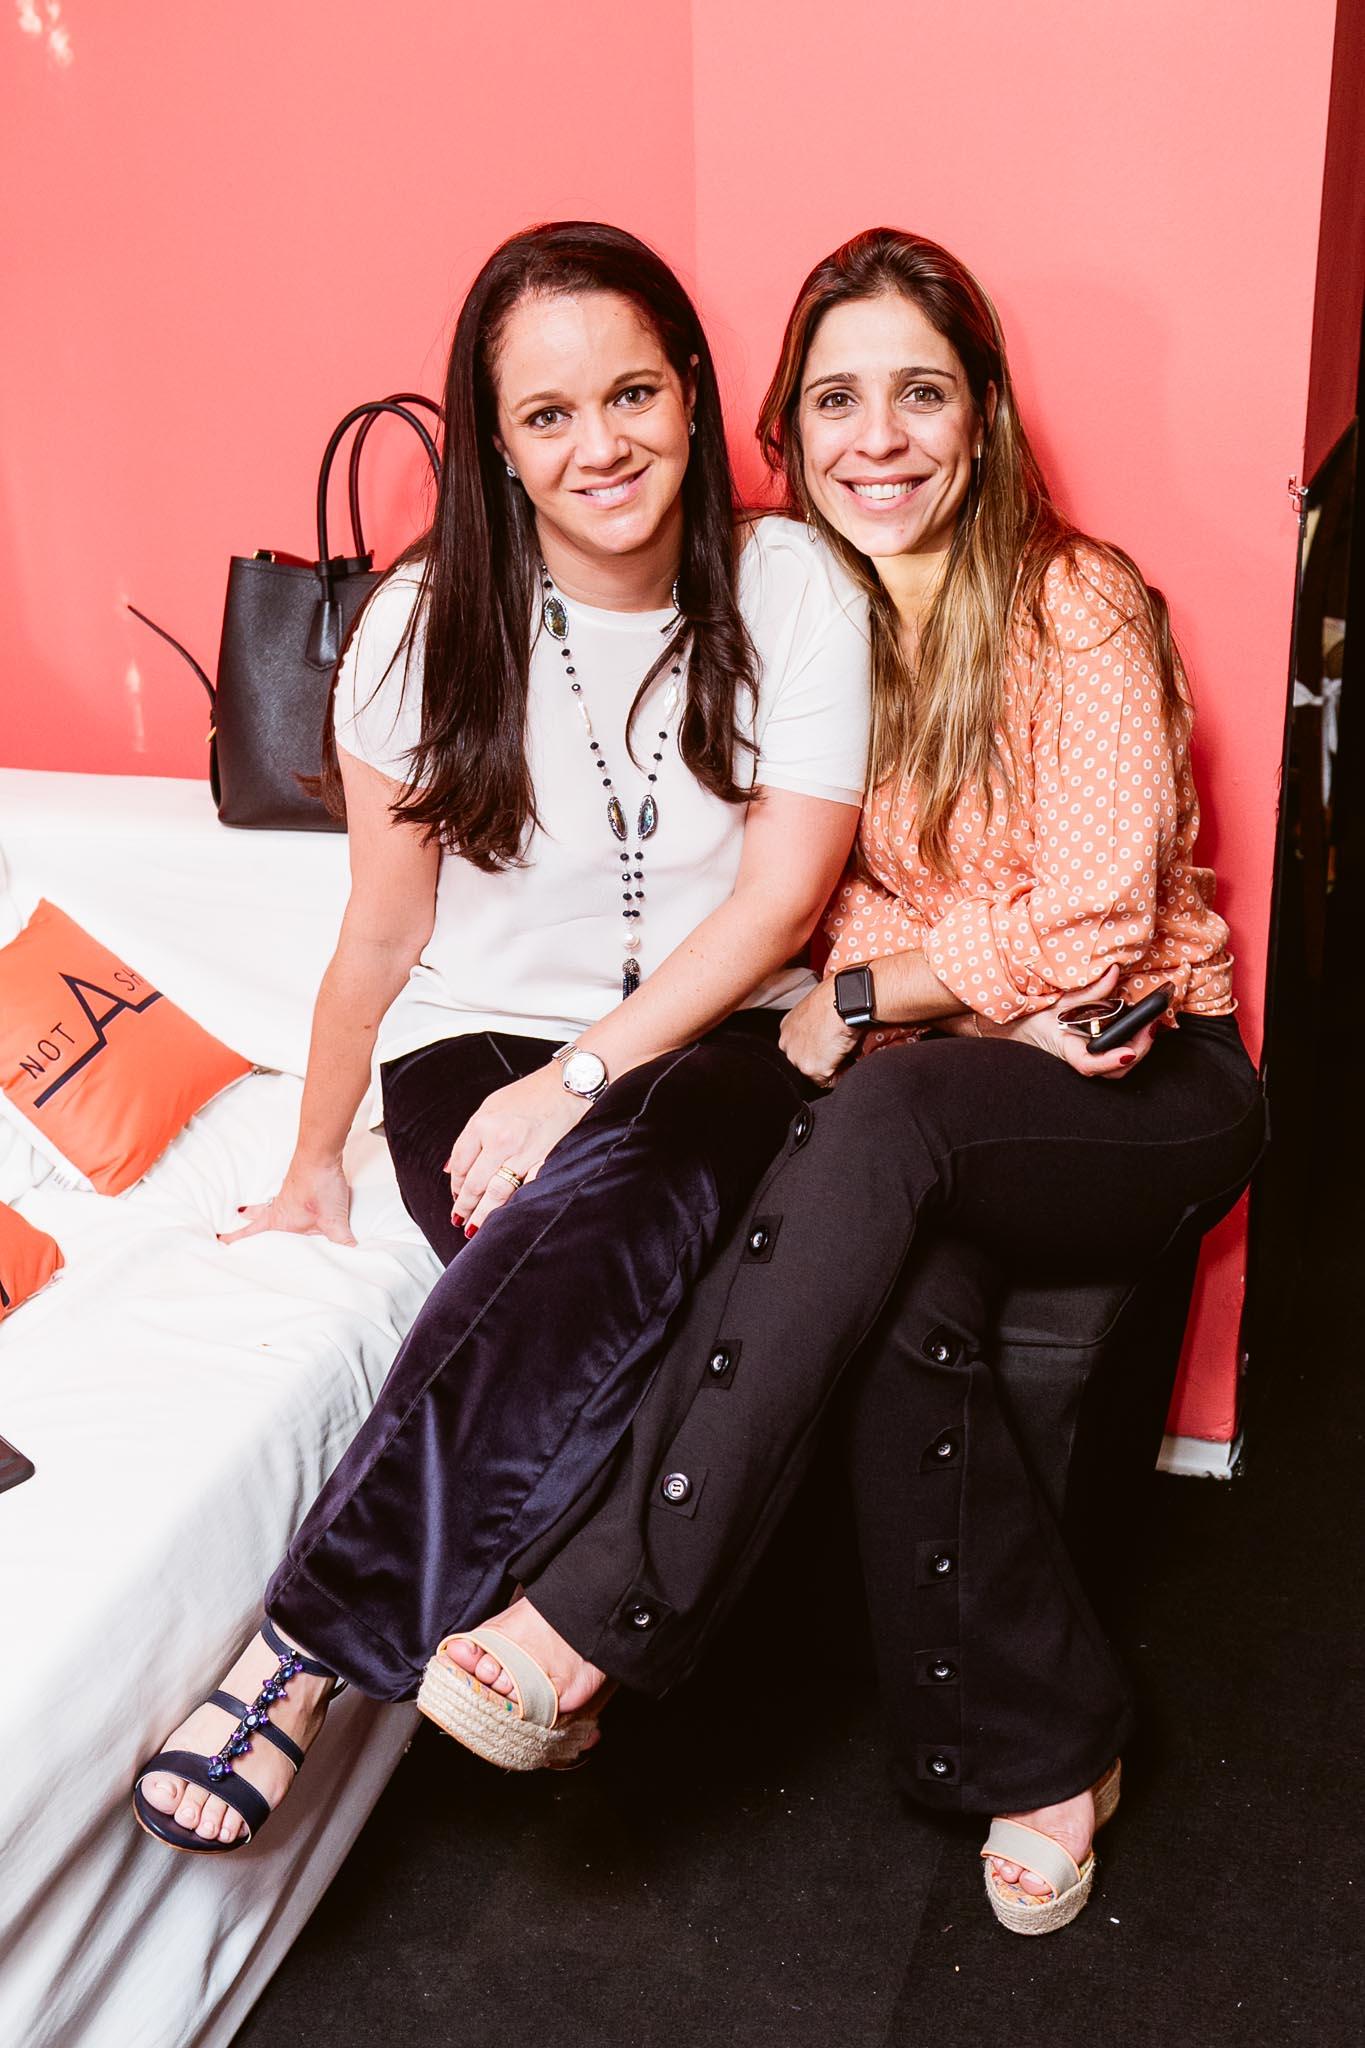 Andrea Lage e Luciana Fernandes